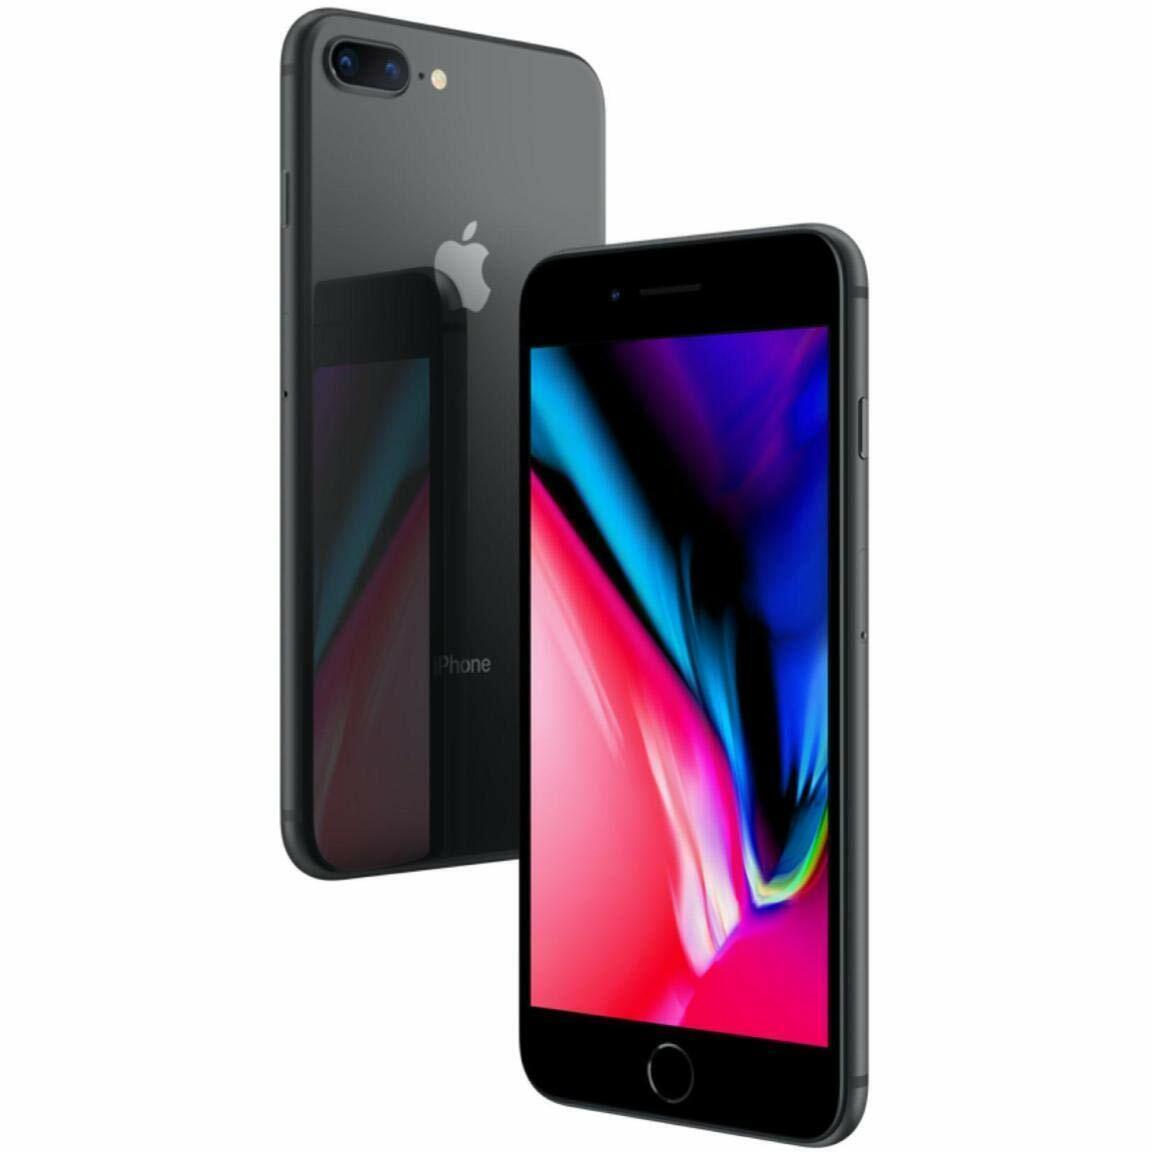 Apple iPhone 8 Plus 🍎 64GB Space Gray Verizon T-Mobile AT&T Unlocked Smartphone